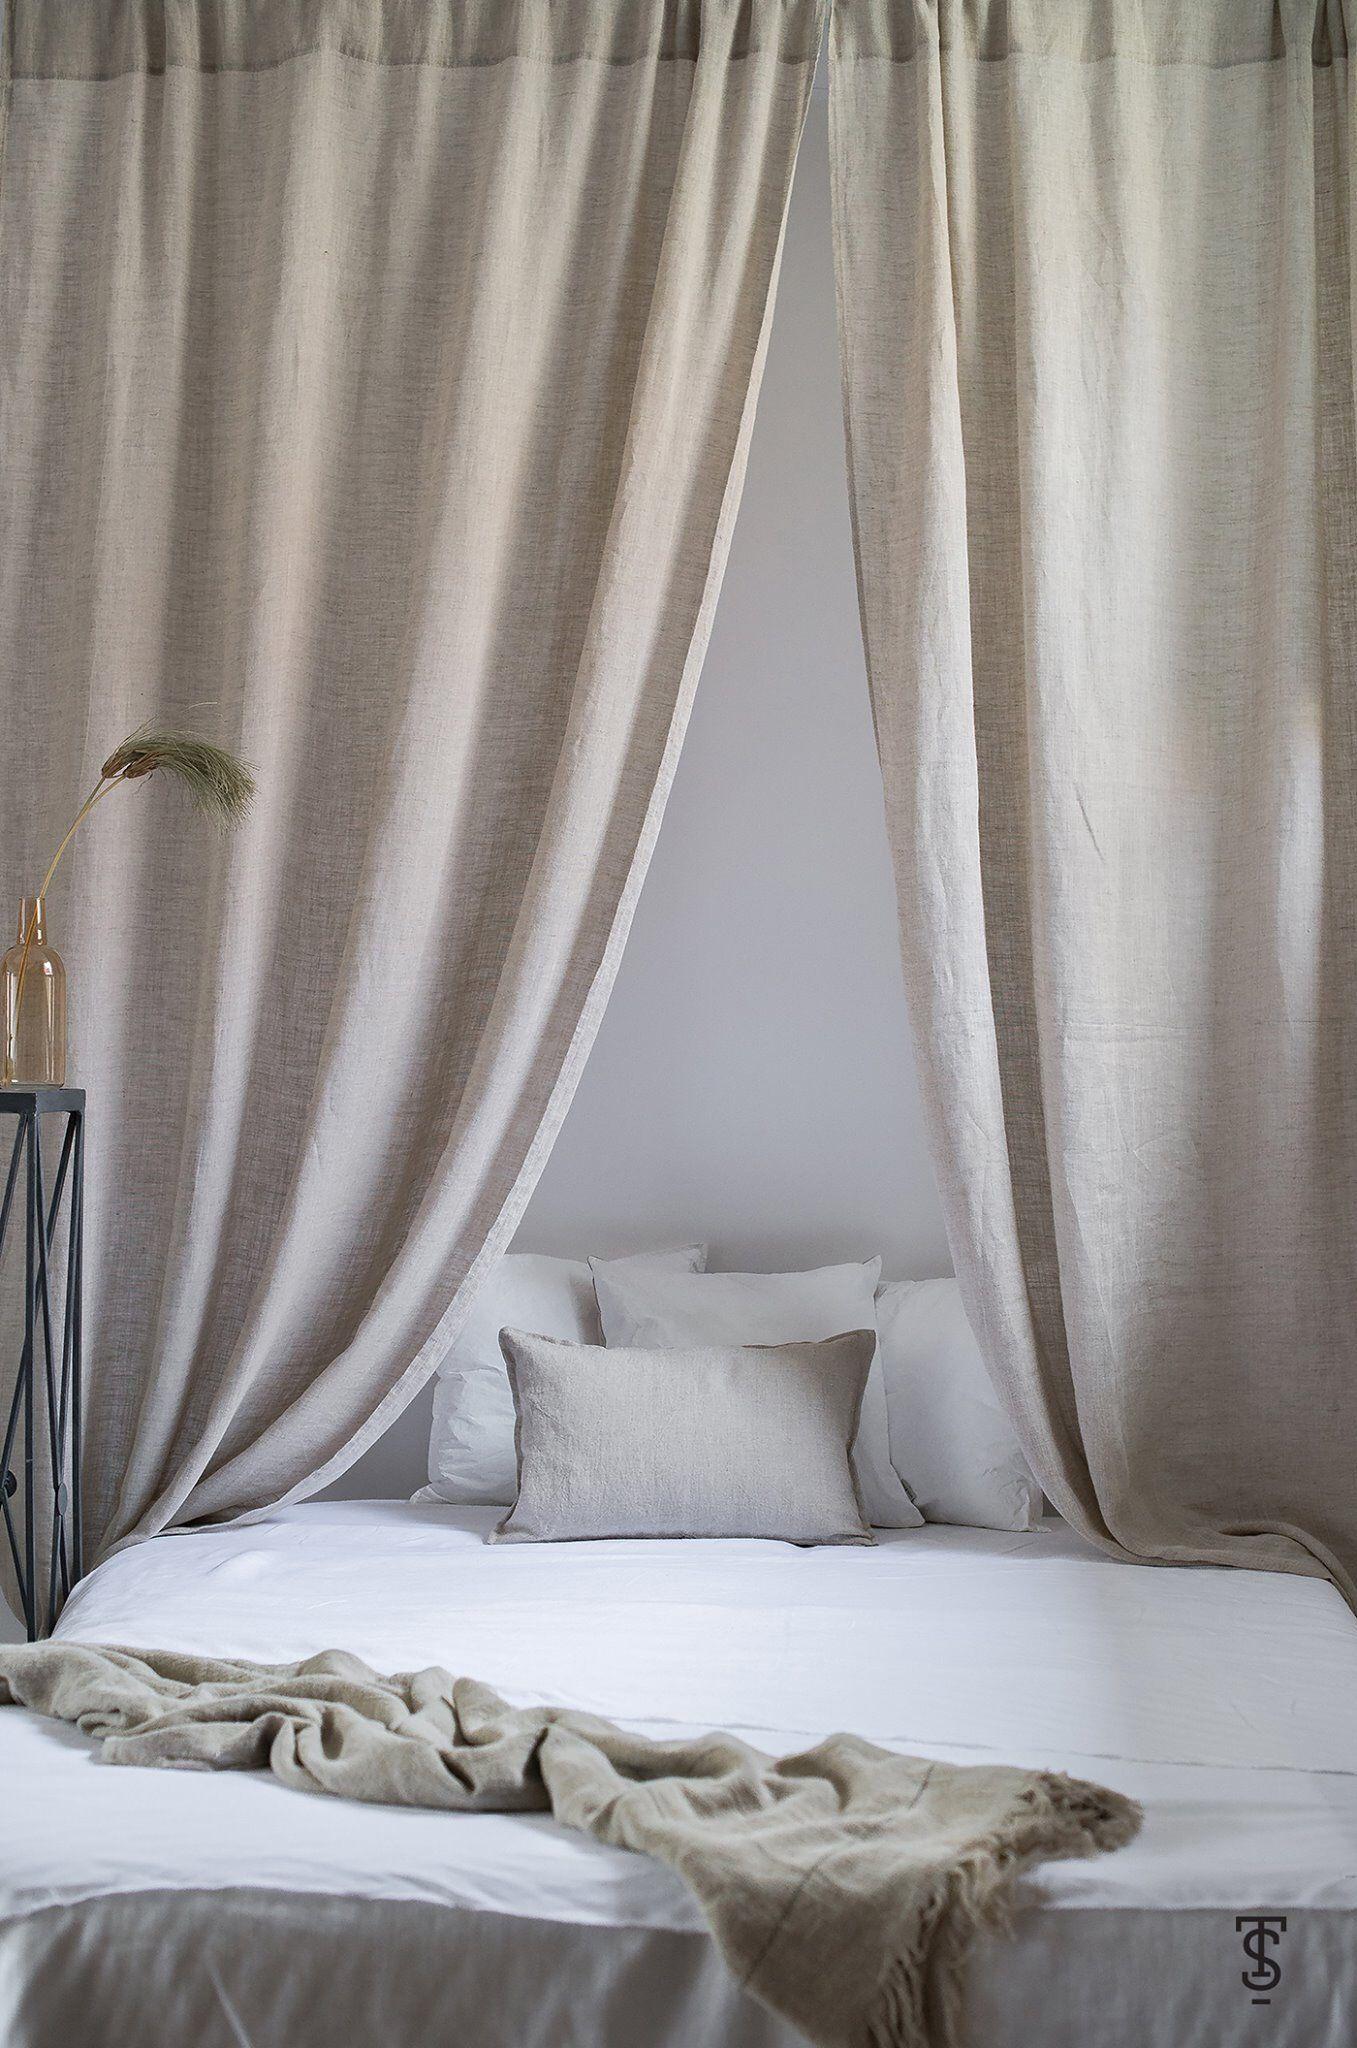 Lekka Przezroczysta Lniana Firana Linen Curtains Rod Pocket Curtains Canopy Bed